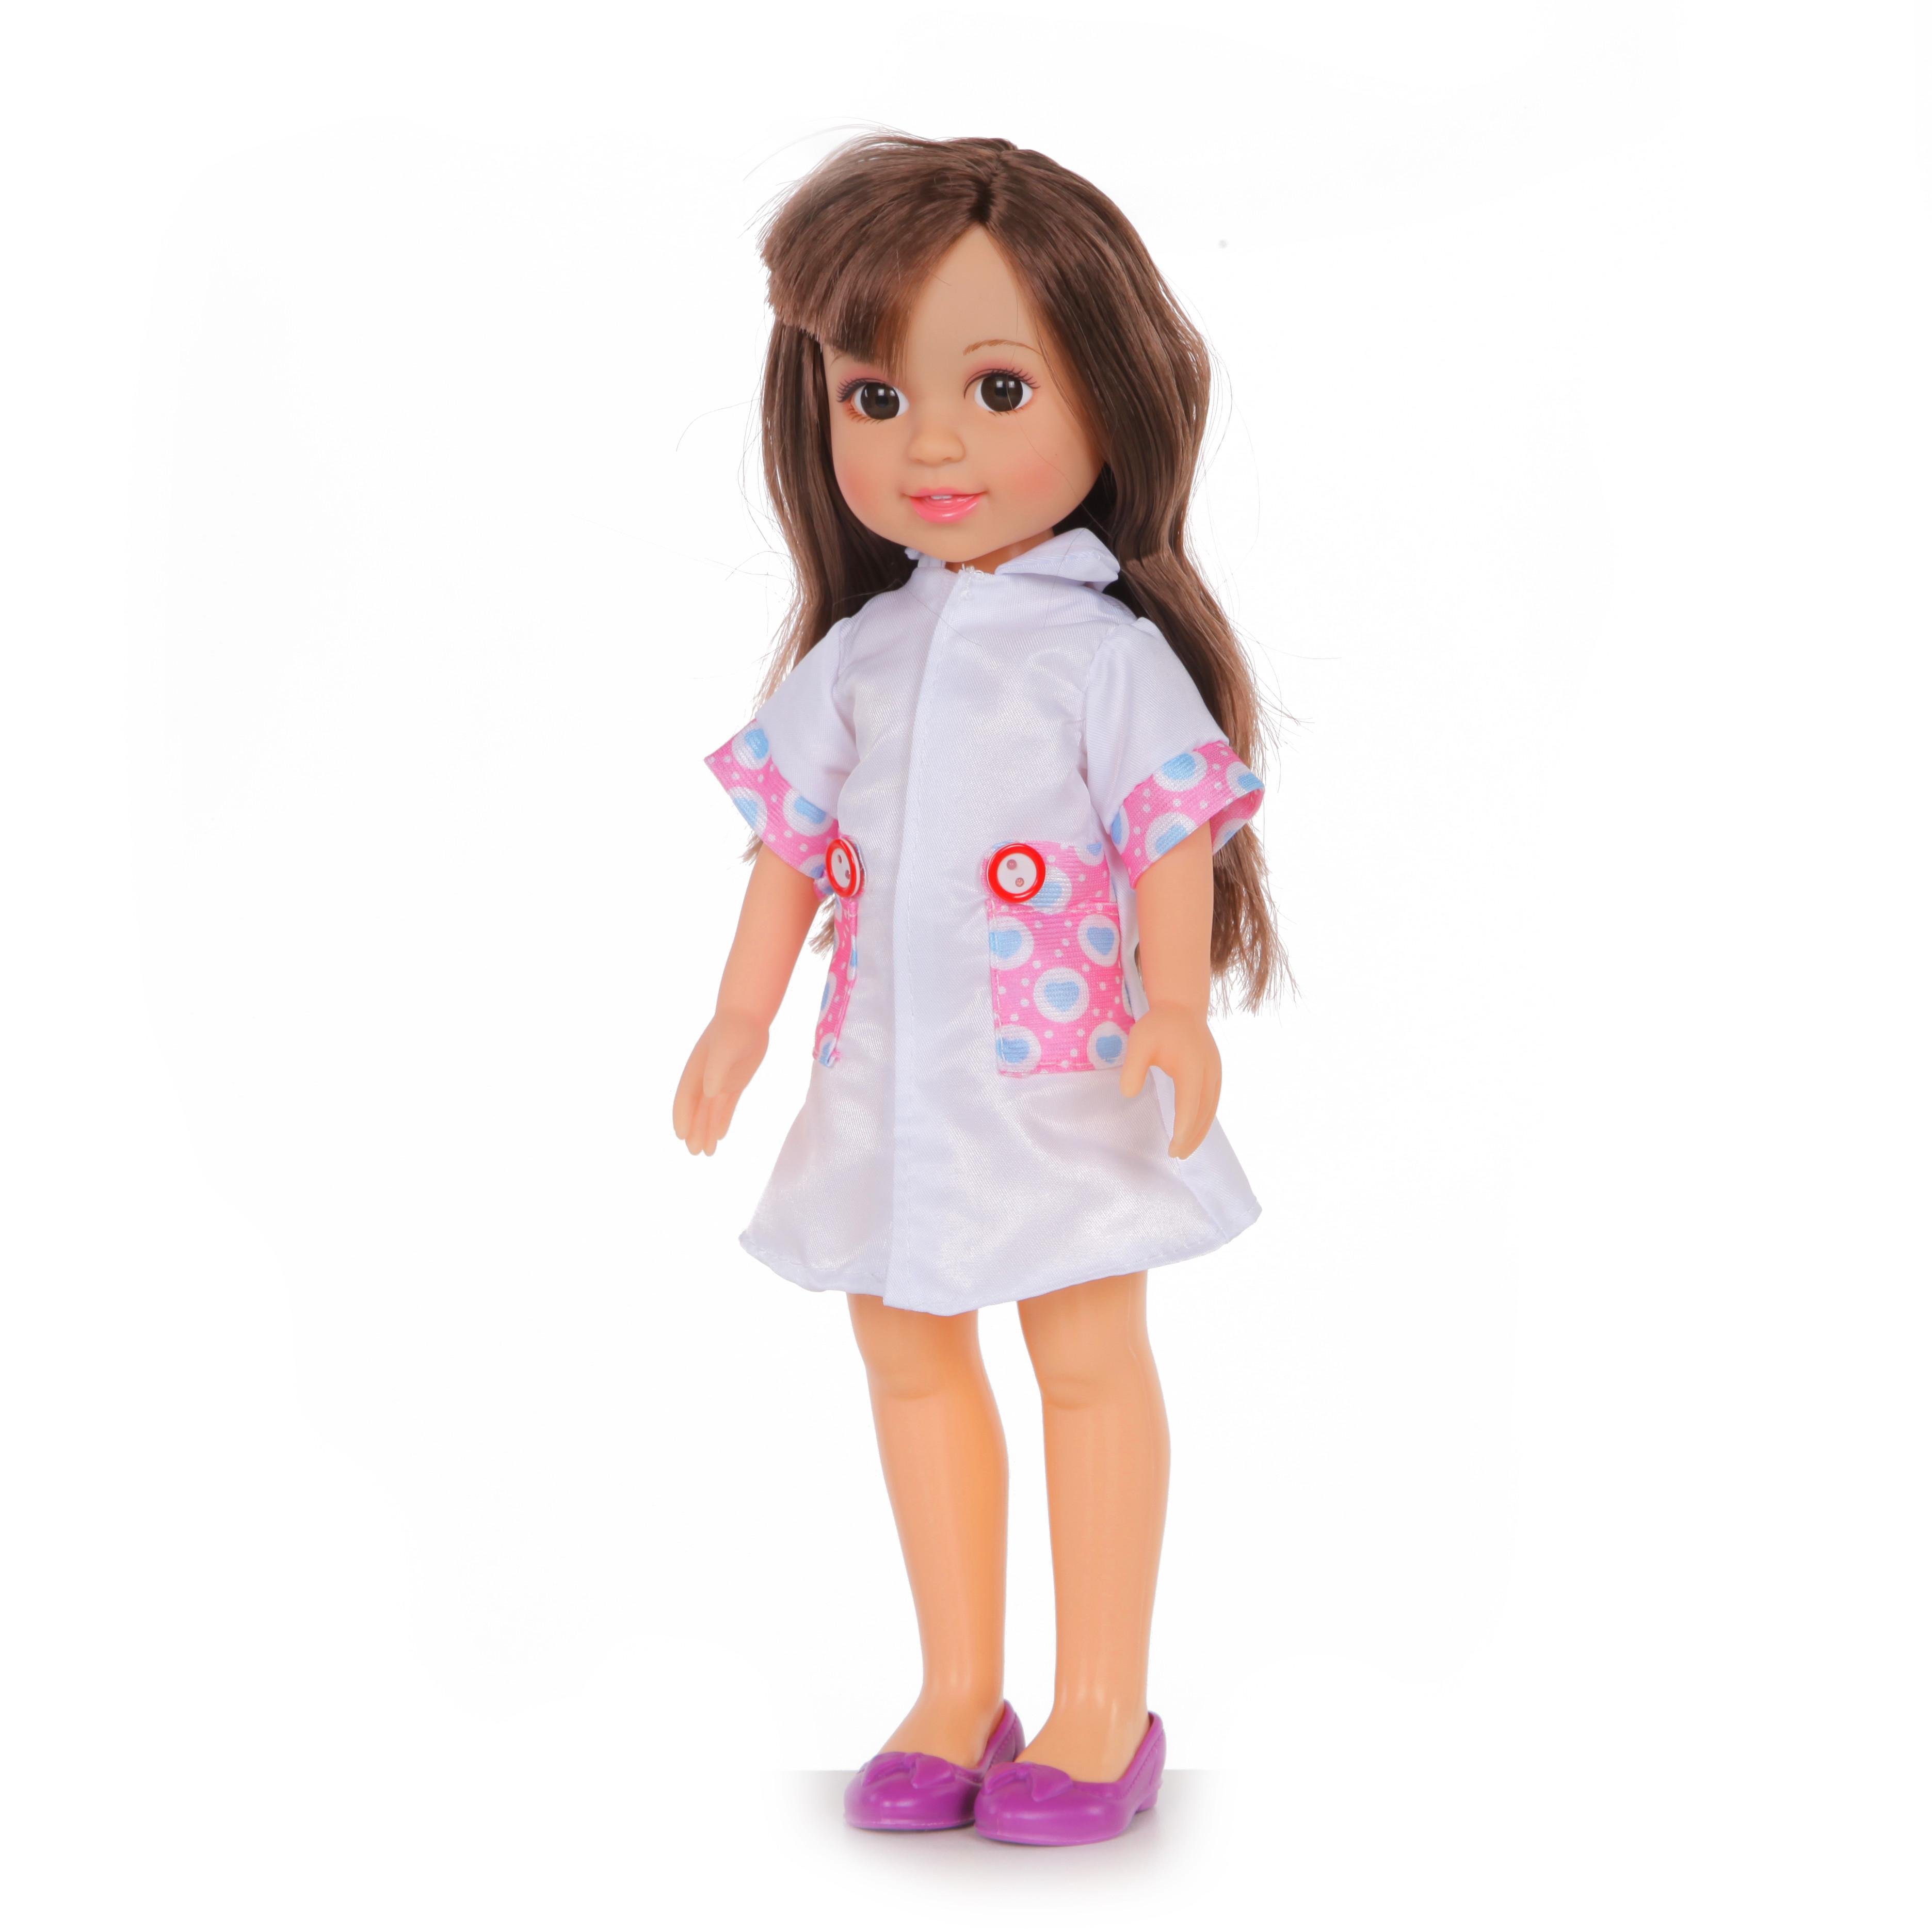 Другие куклы YAKO Кукла Yako Jammy «Доктор» 32 см кукла yako катенька m6620